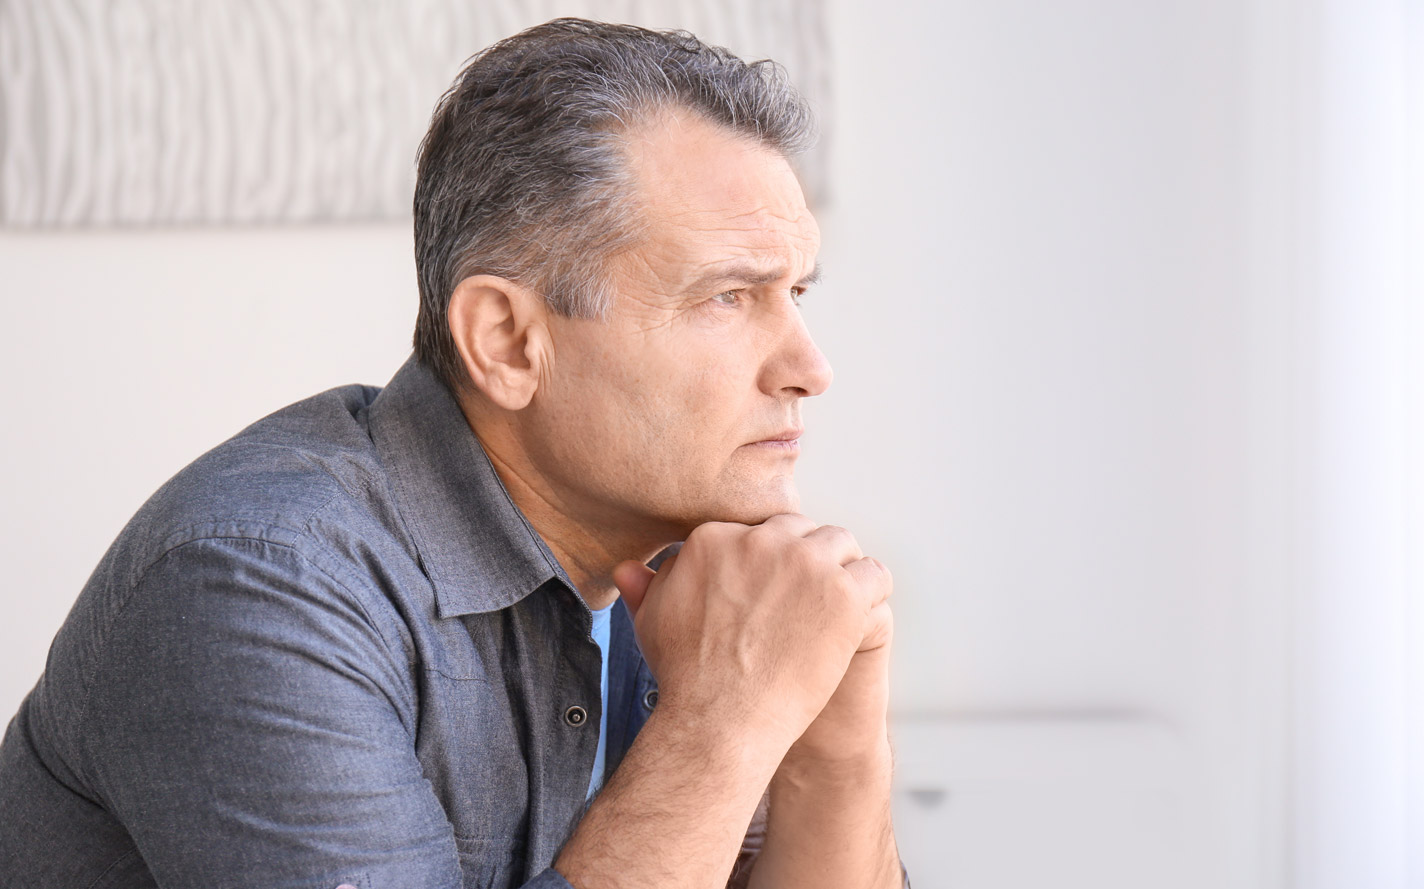 Older man contemplating his health.